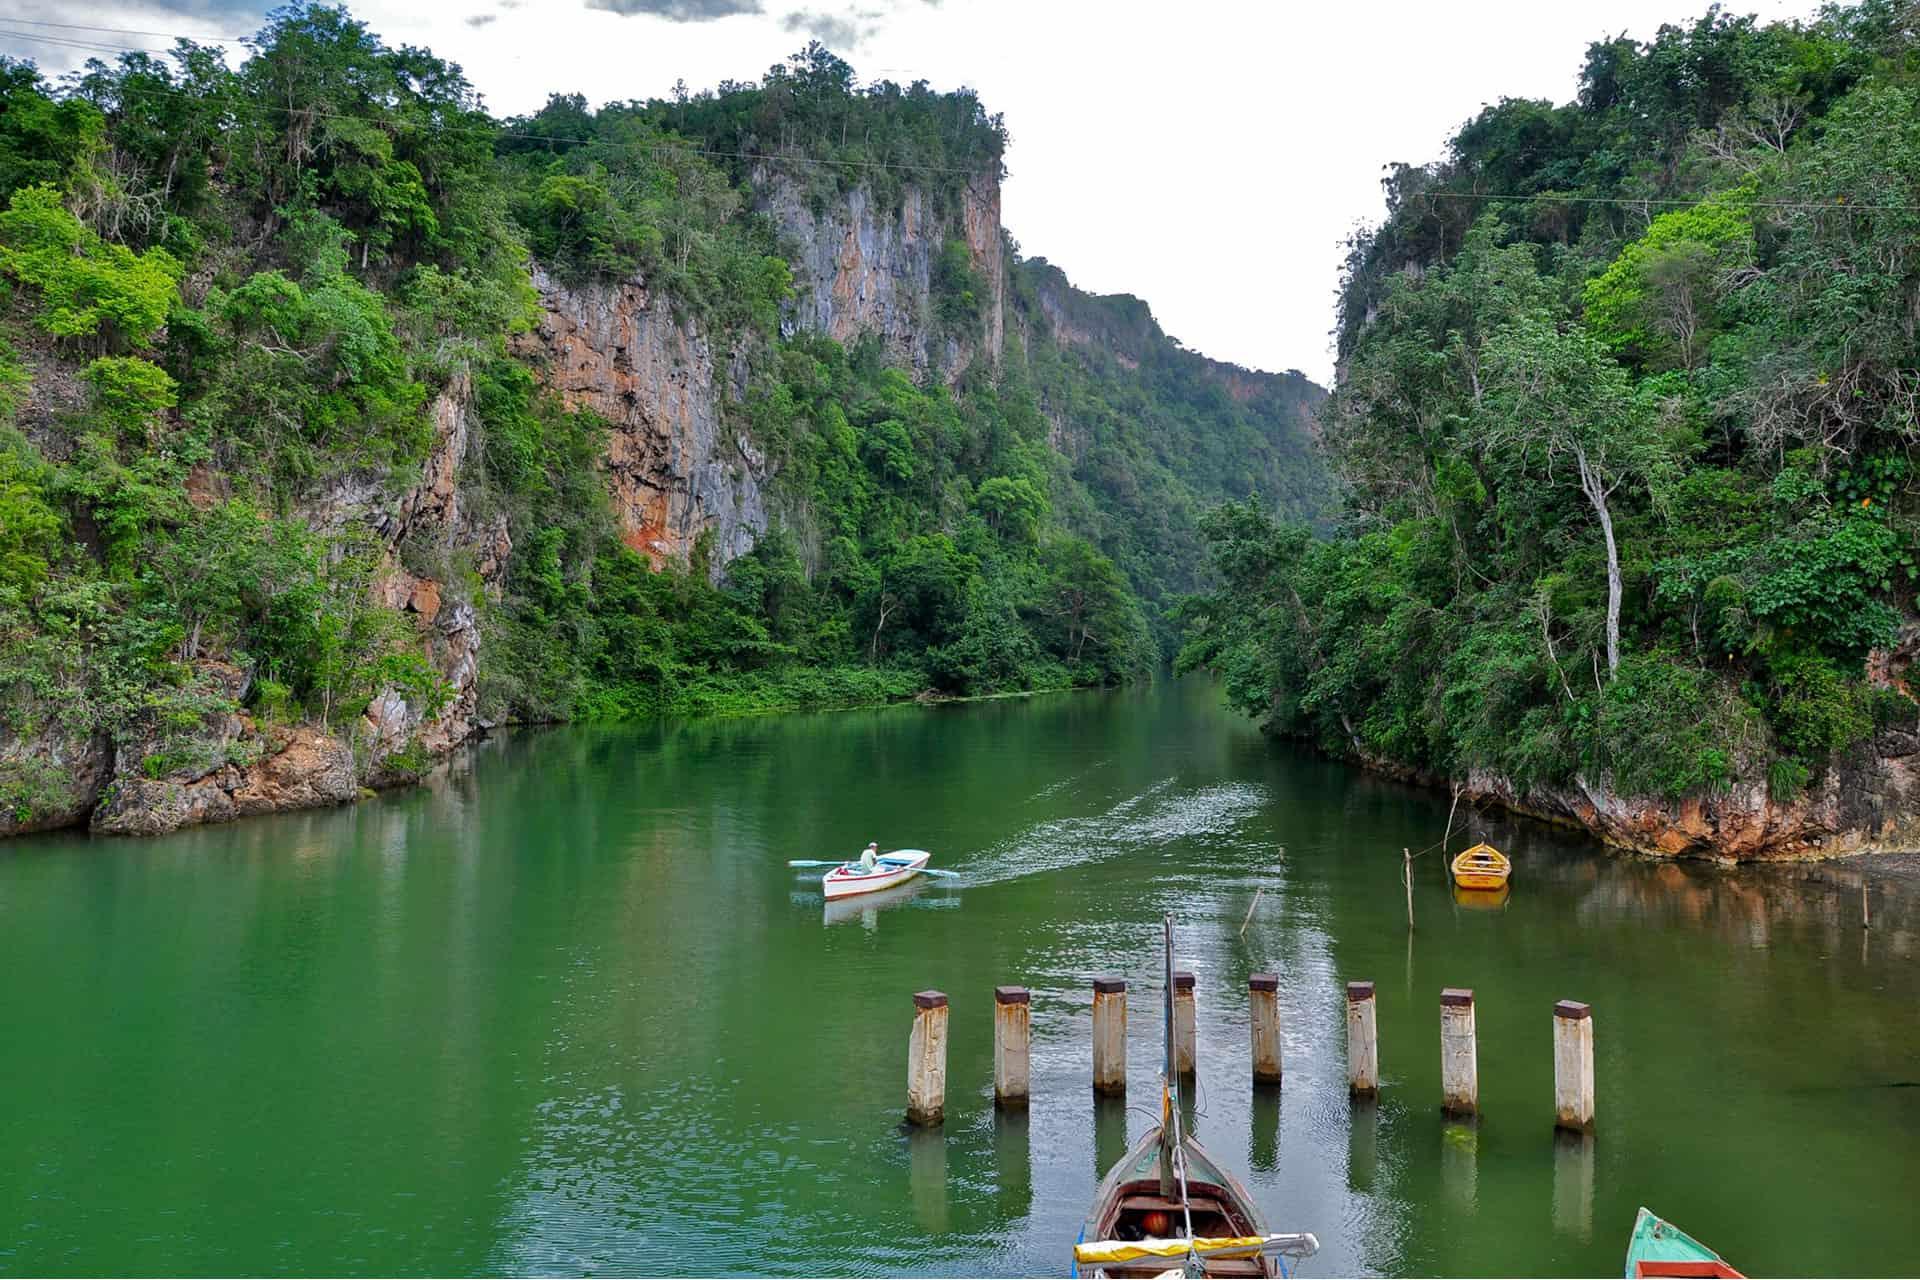 baracoa paysage riviere yumuri cuba autrement 1